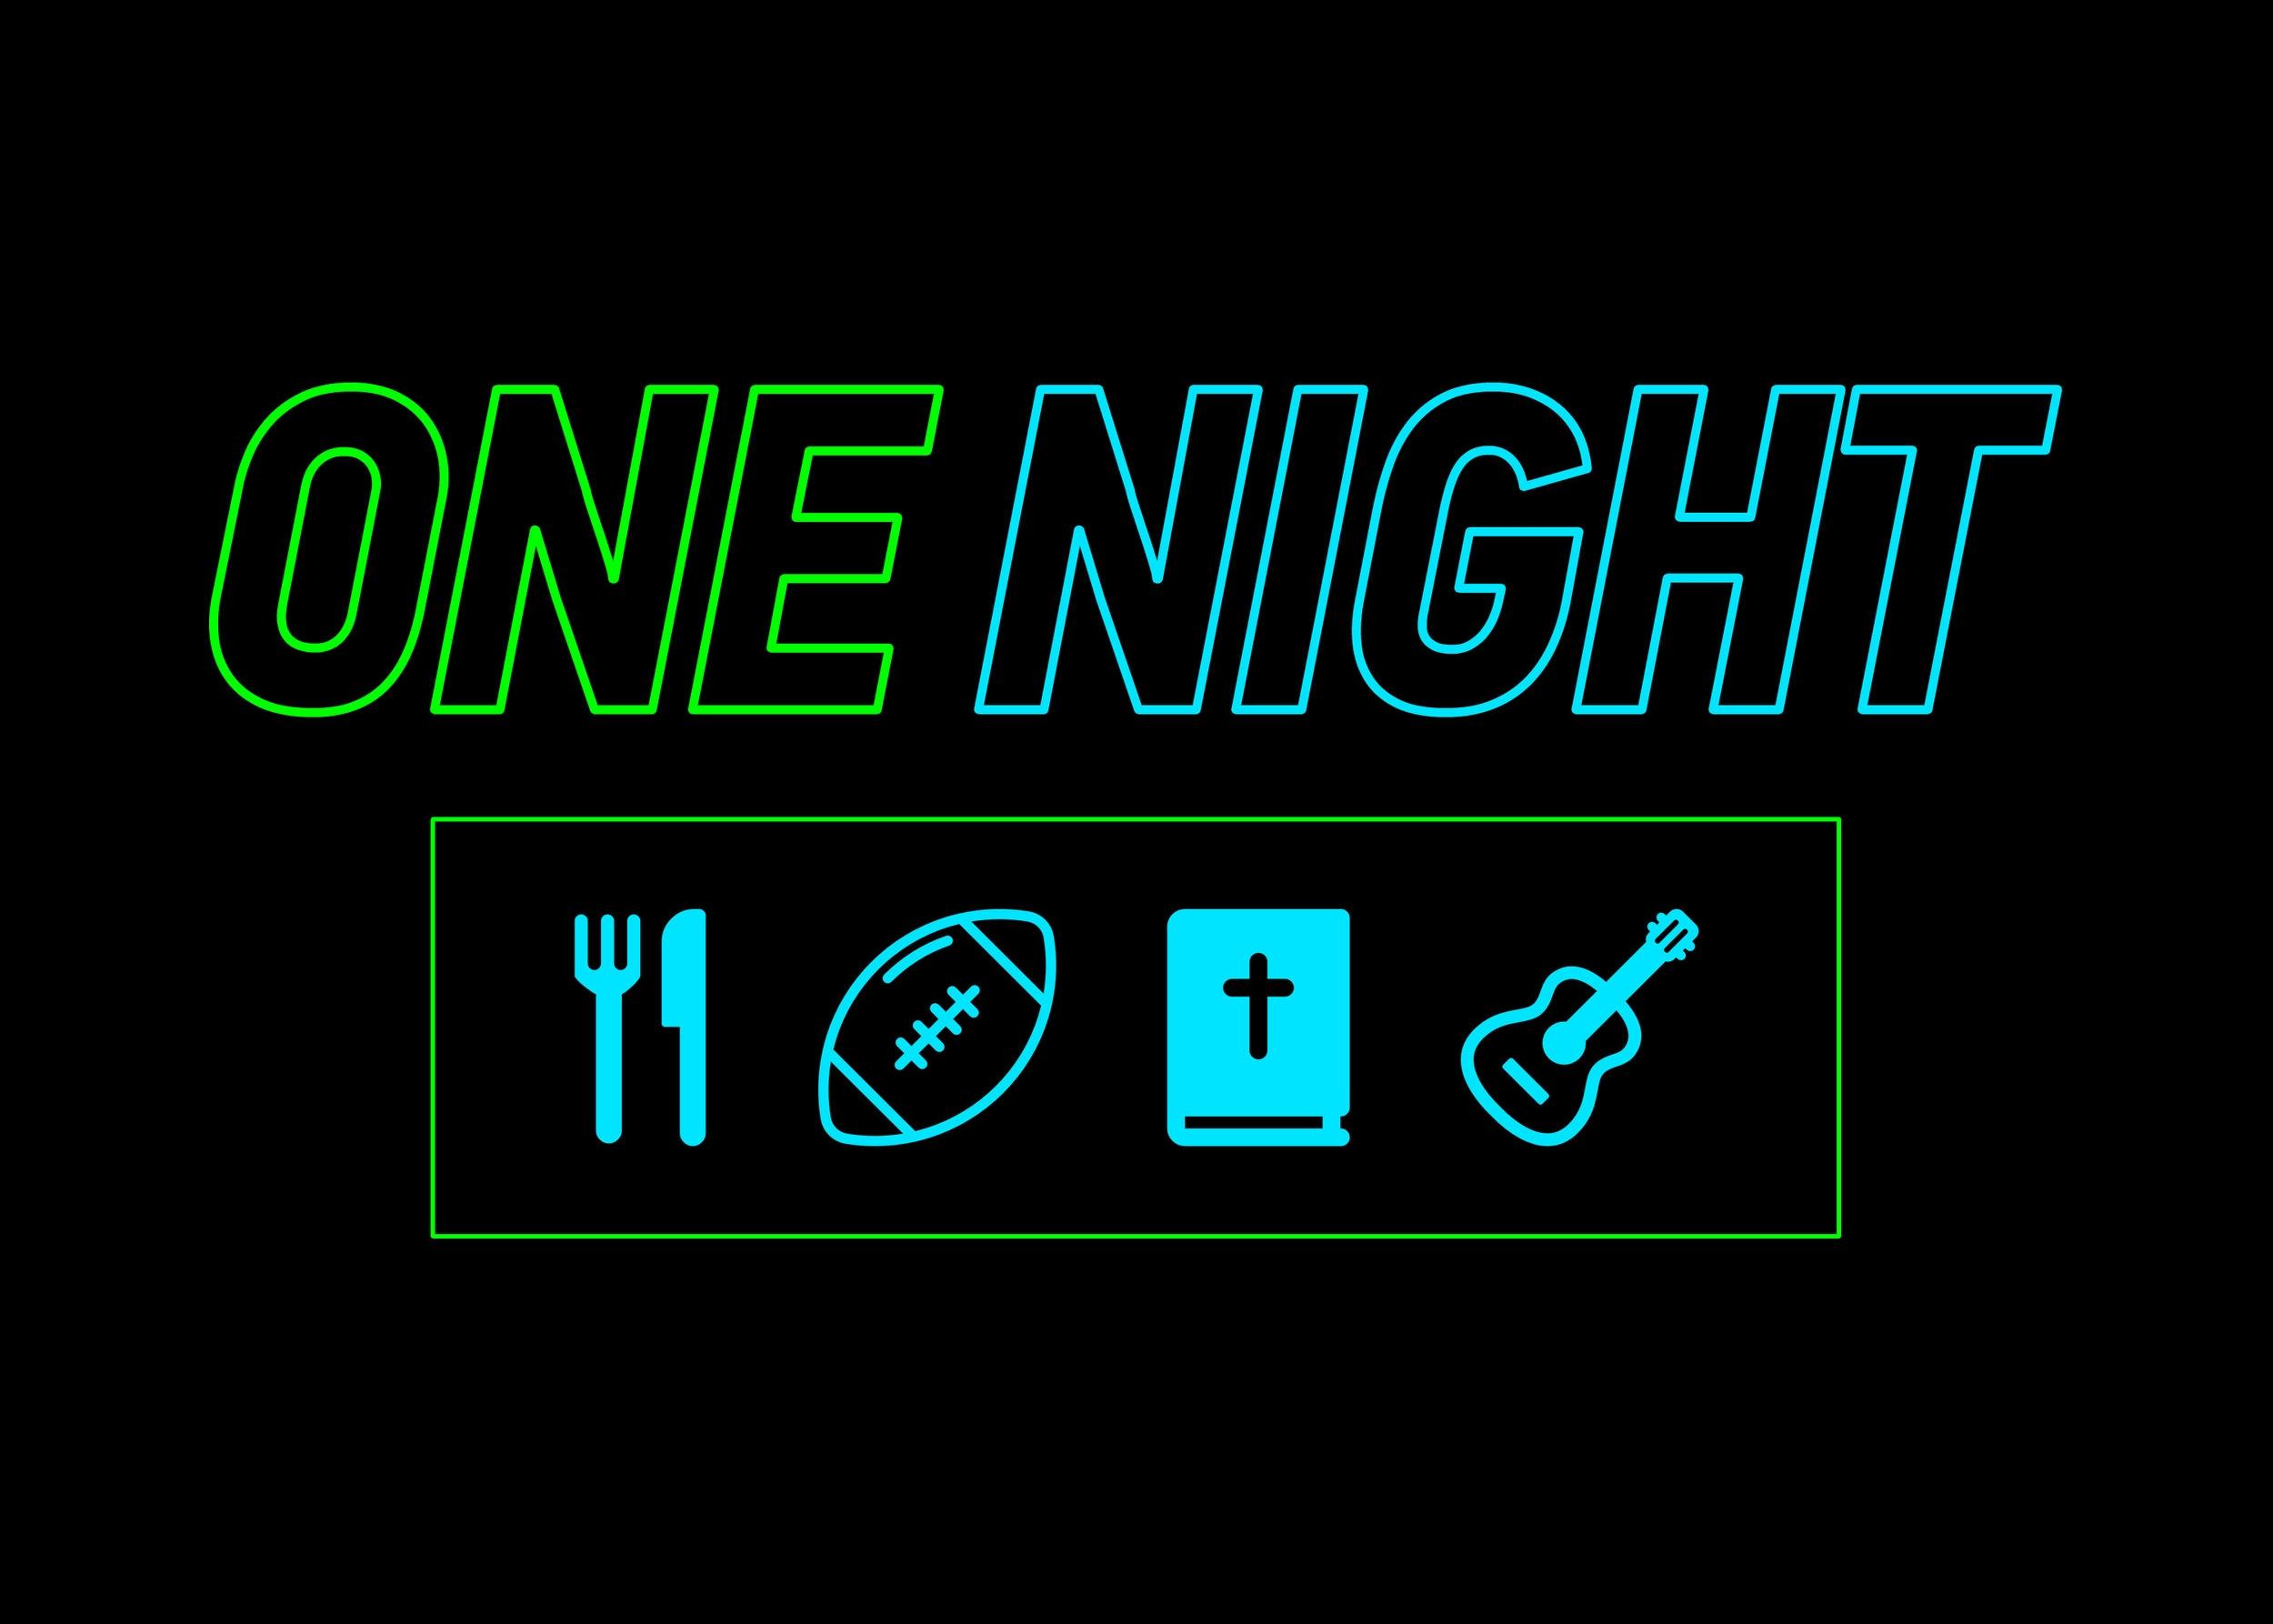 one night logo.jpg